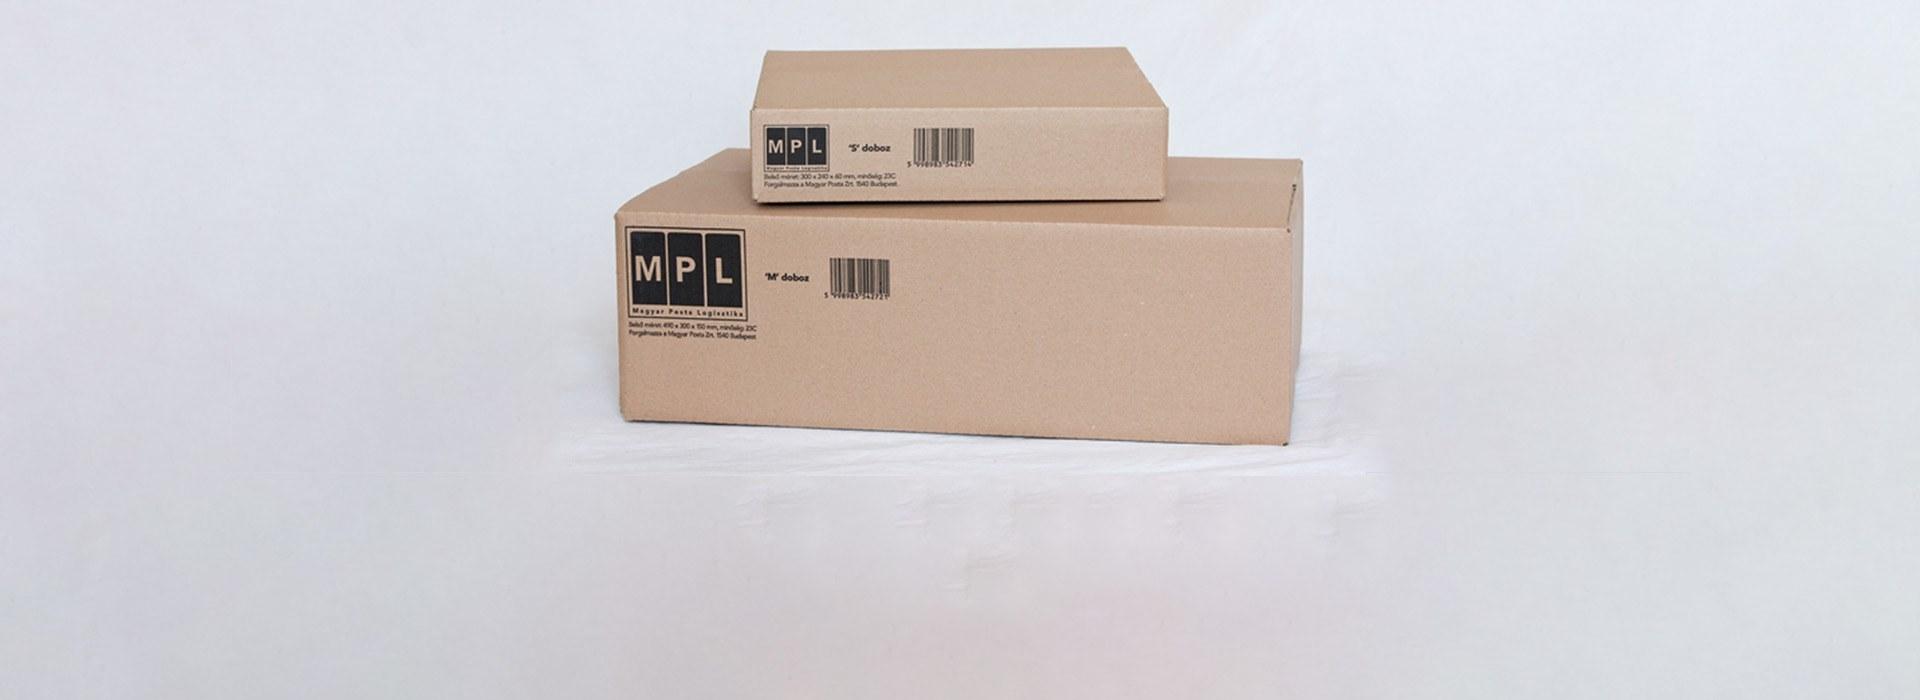 dcbef4294a Magyar Posta Zrt. - MPL Üzleti csomag